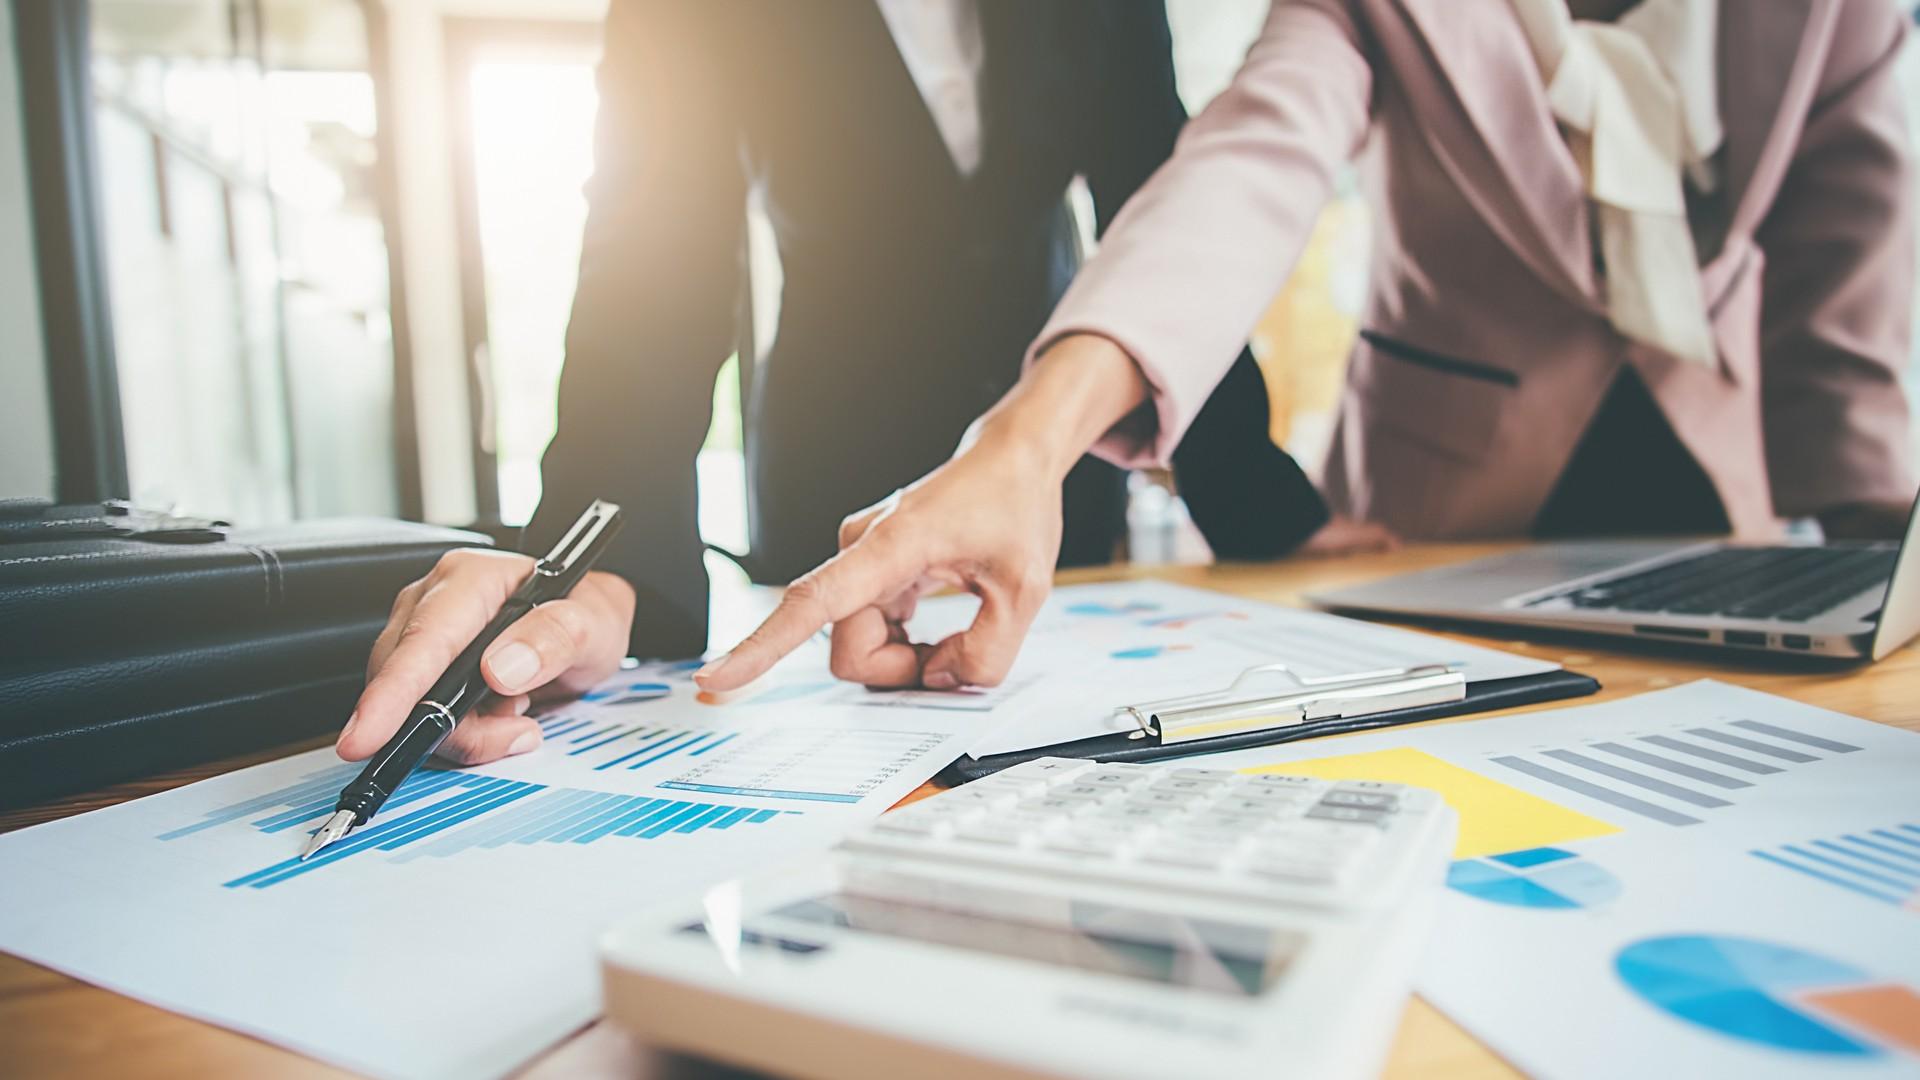 0oBi7WDQWDC56wE5M - Training Analisis Pinjaman Terpadu dan Mekanisme Pelayanan Pinjaman Melalui PKBL